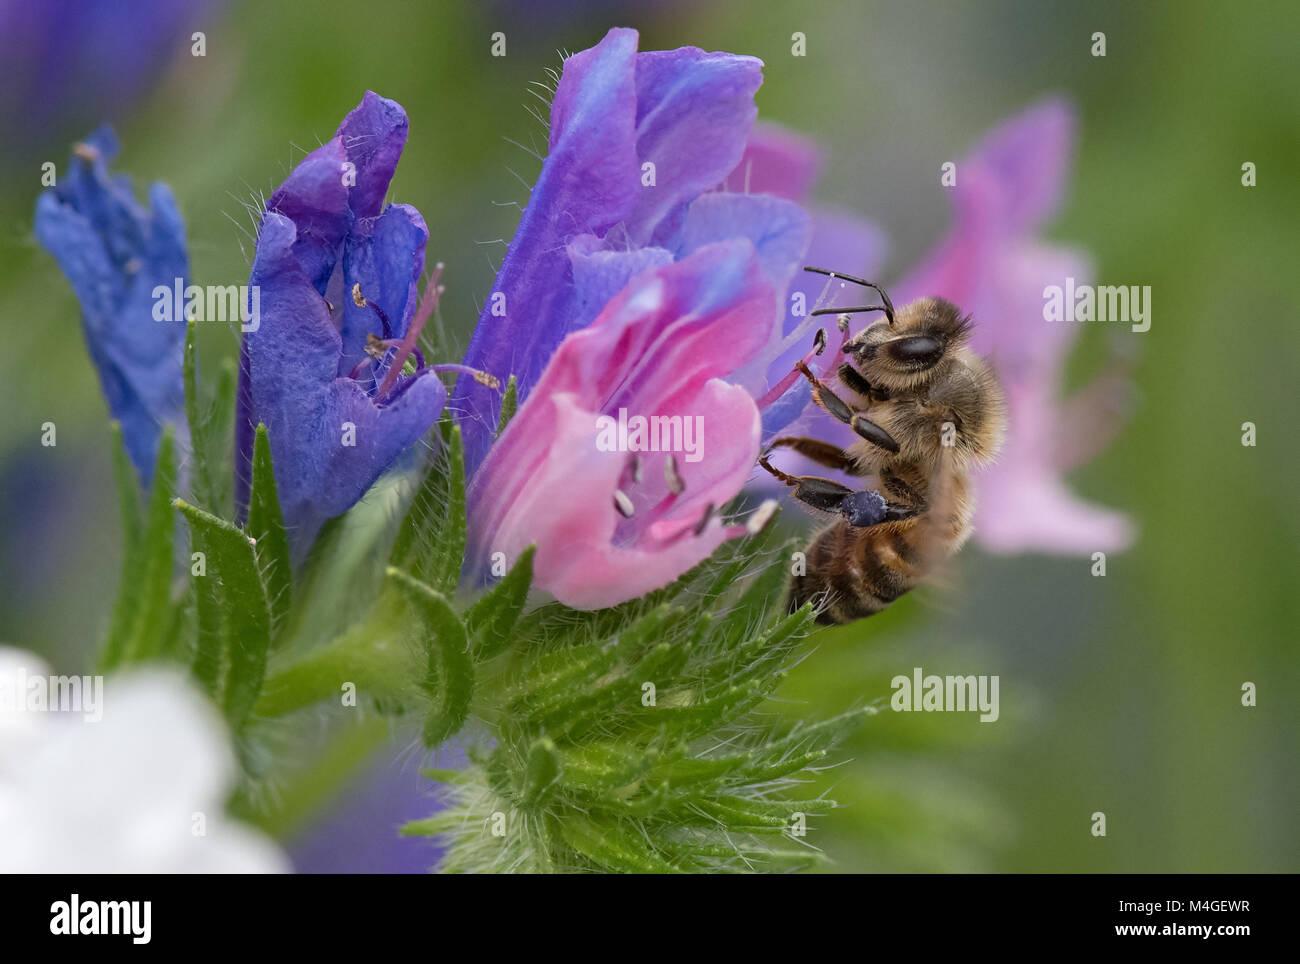 Honeybee-Apis mellifera nectaring on wild flowers. Uk - Stock Image